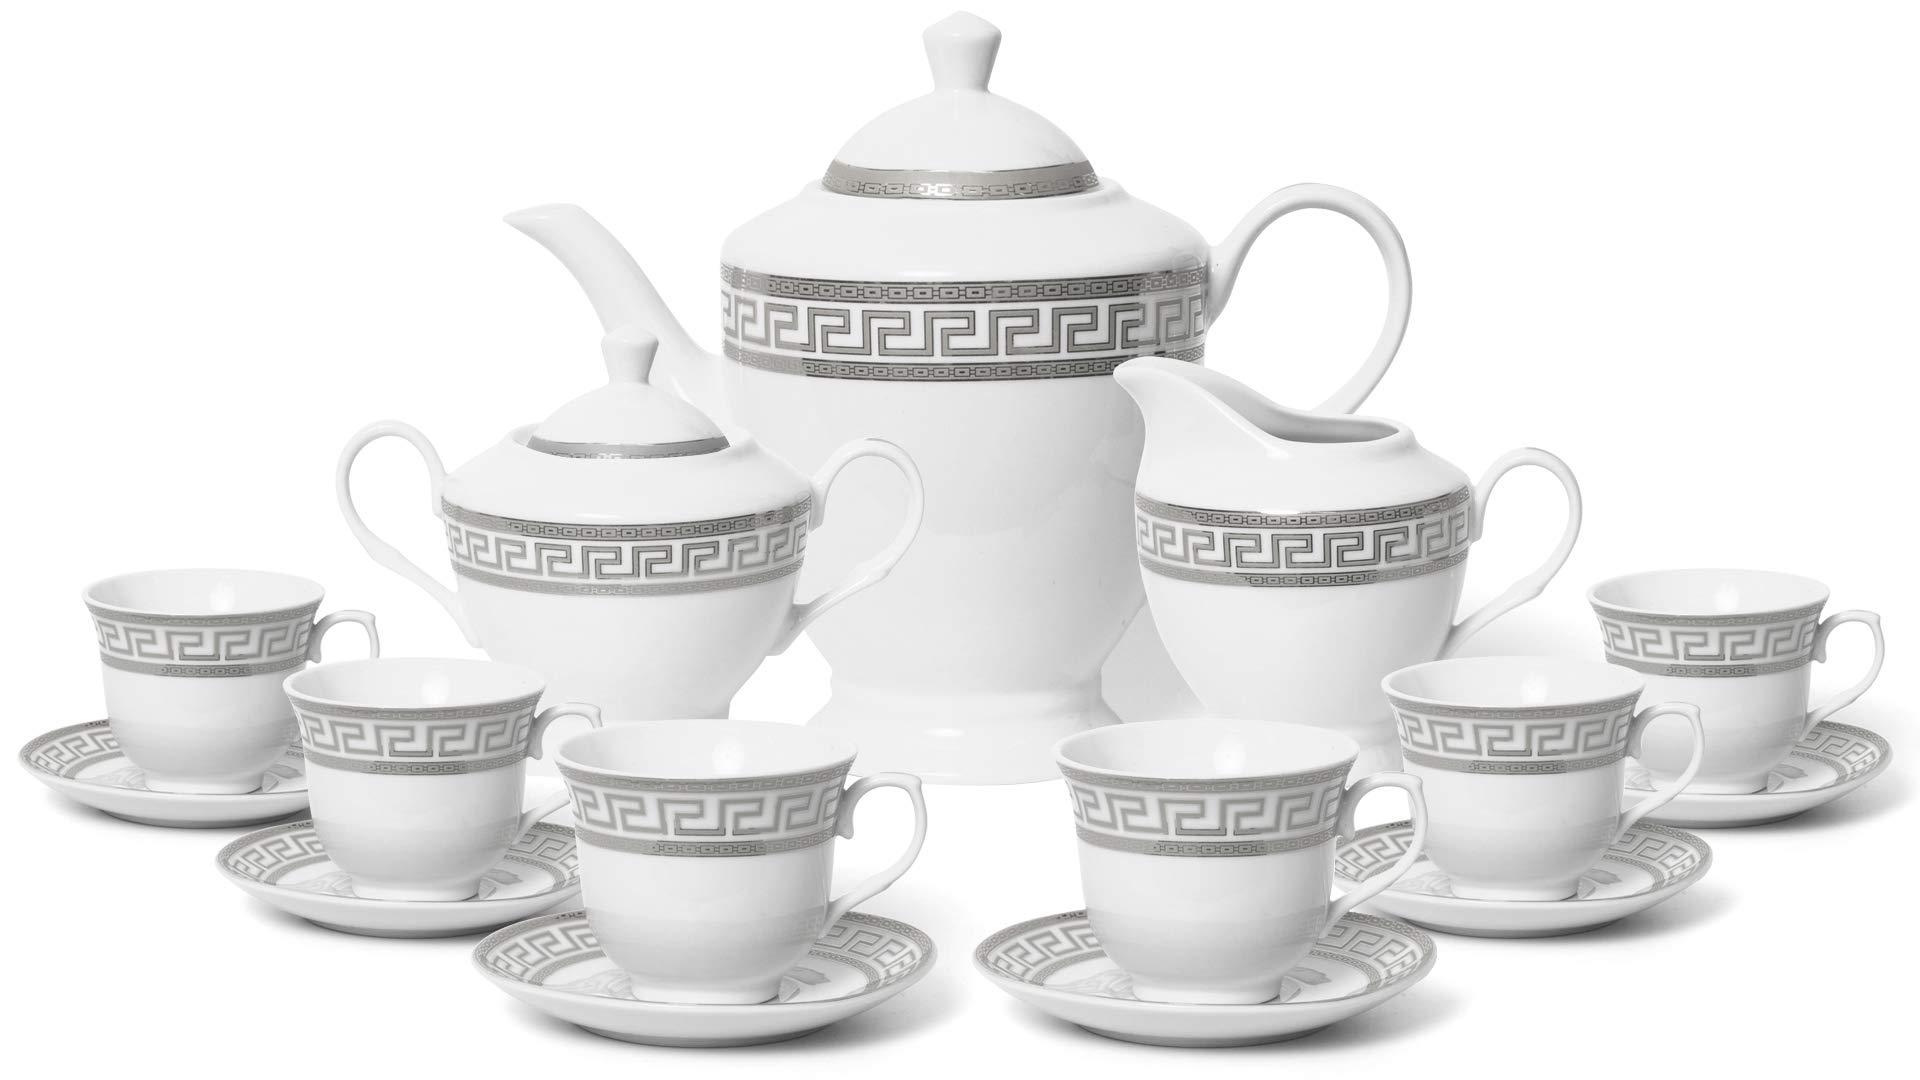 Royalty Porcelain 17-pc Tea Set for 6, Czech Porcelain (Elegant Silver)